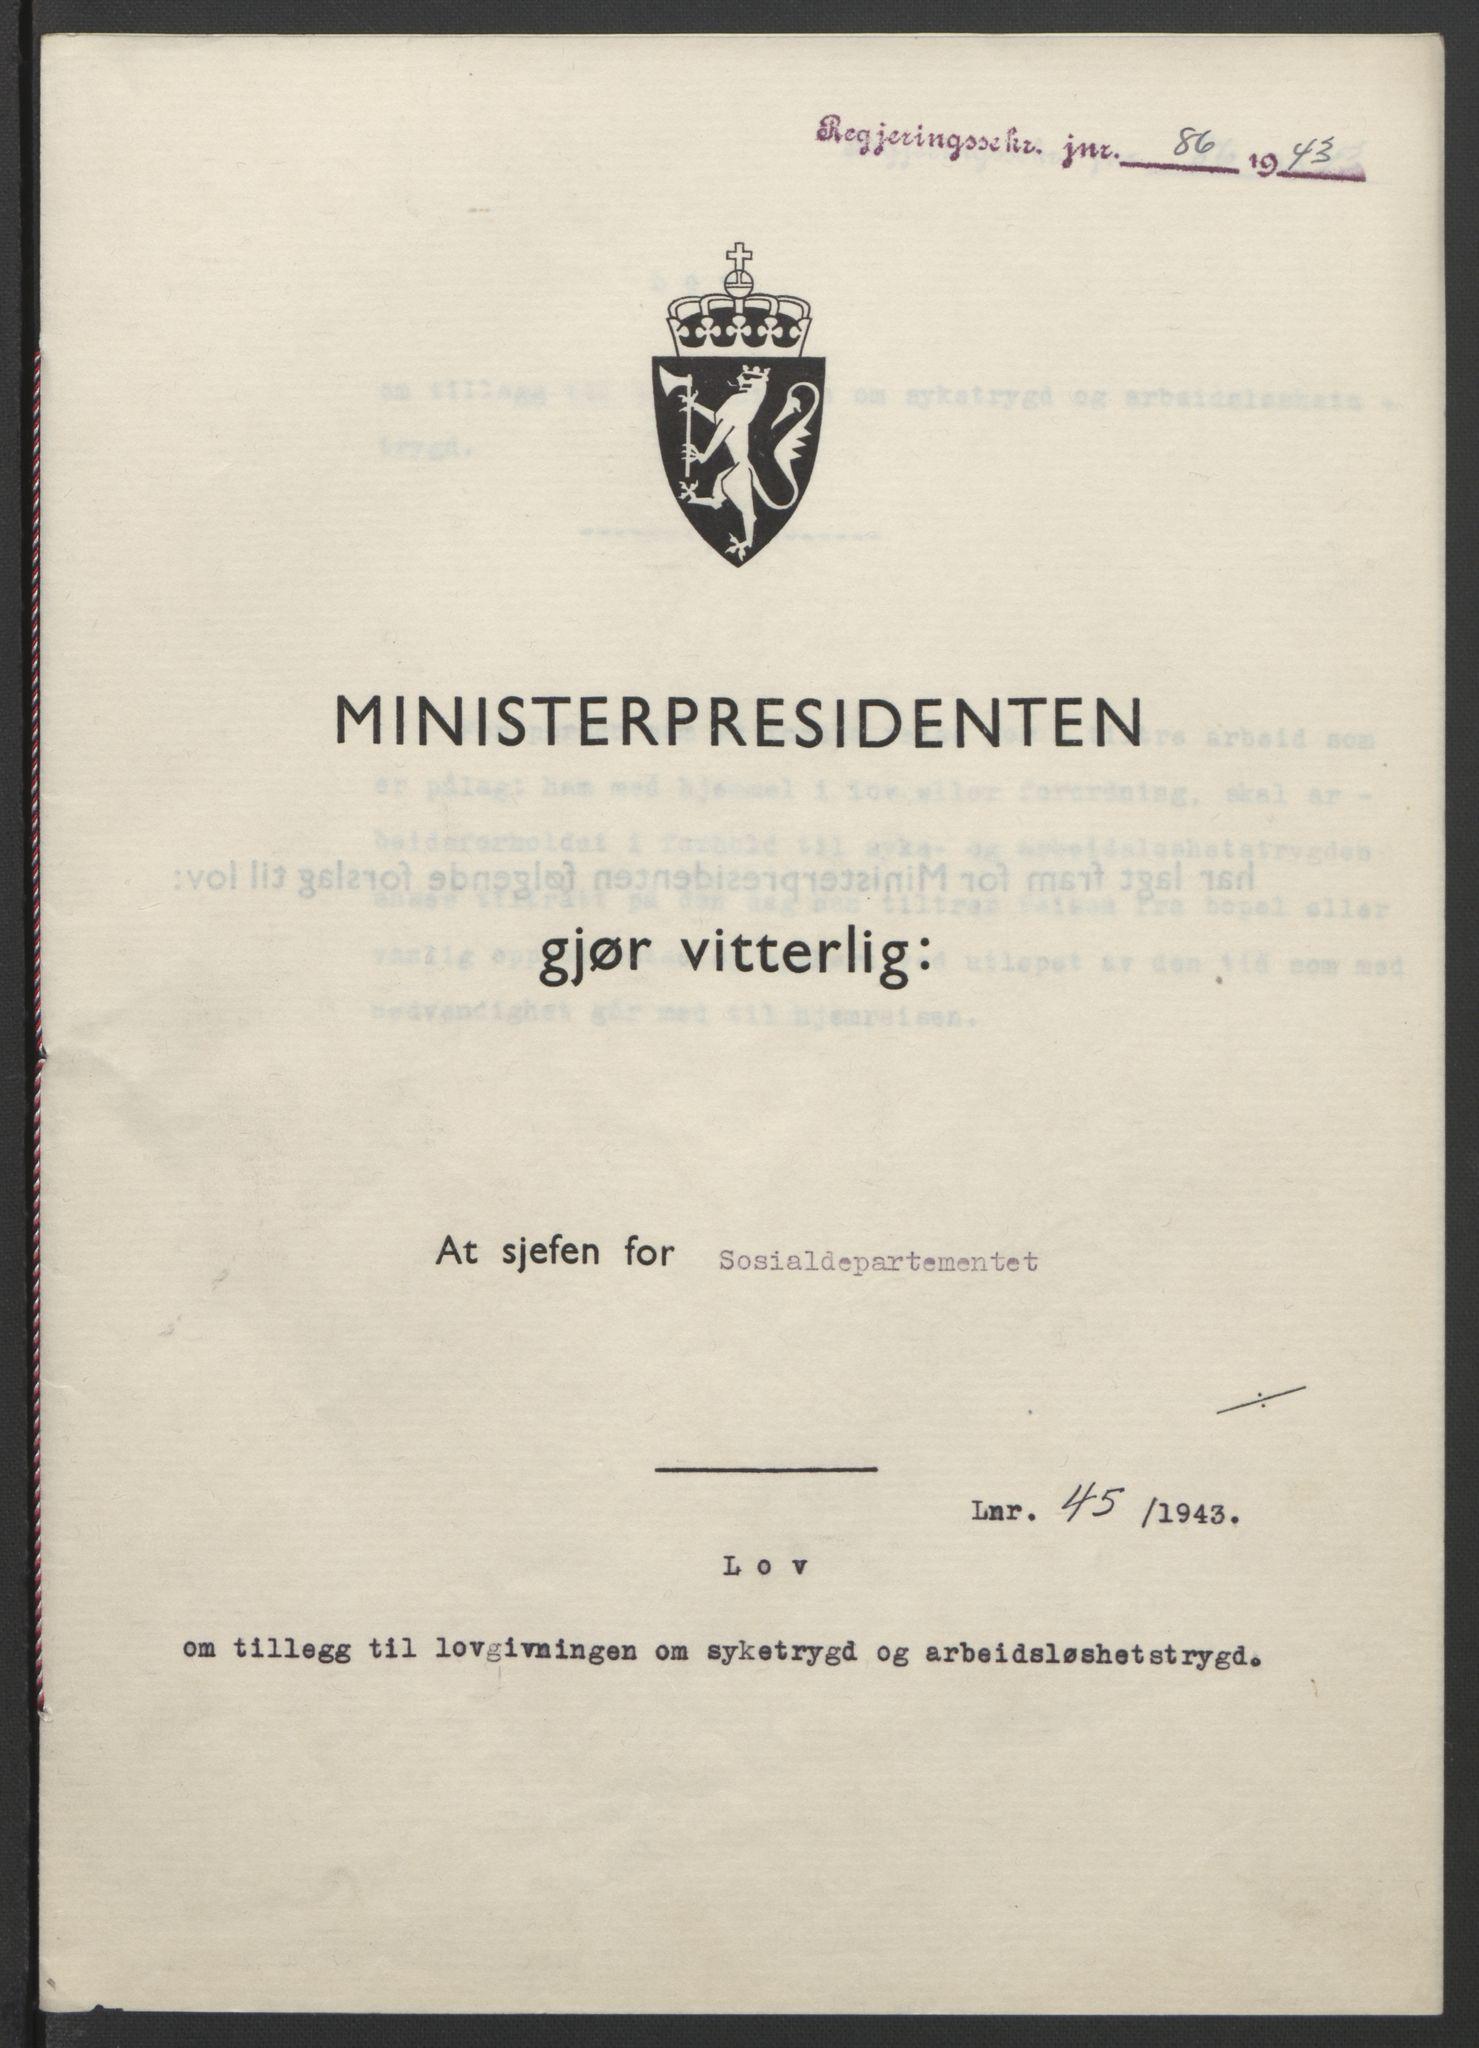 RA, NS-administrasjonen 1940-1945 (Statsrådsekretariatet, de kommisariske statsråder mm), D/Db/L0099: Lover, 1943, s. 196